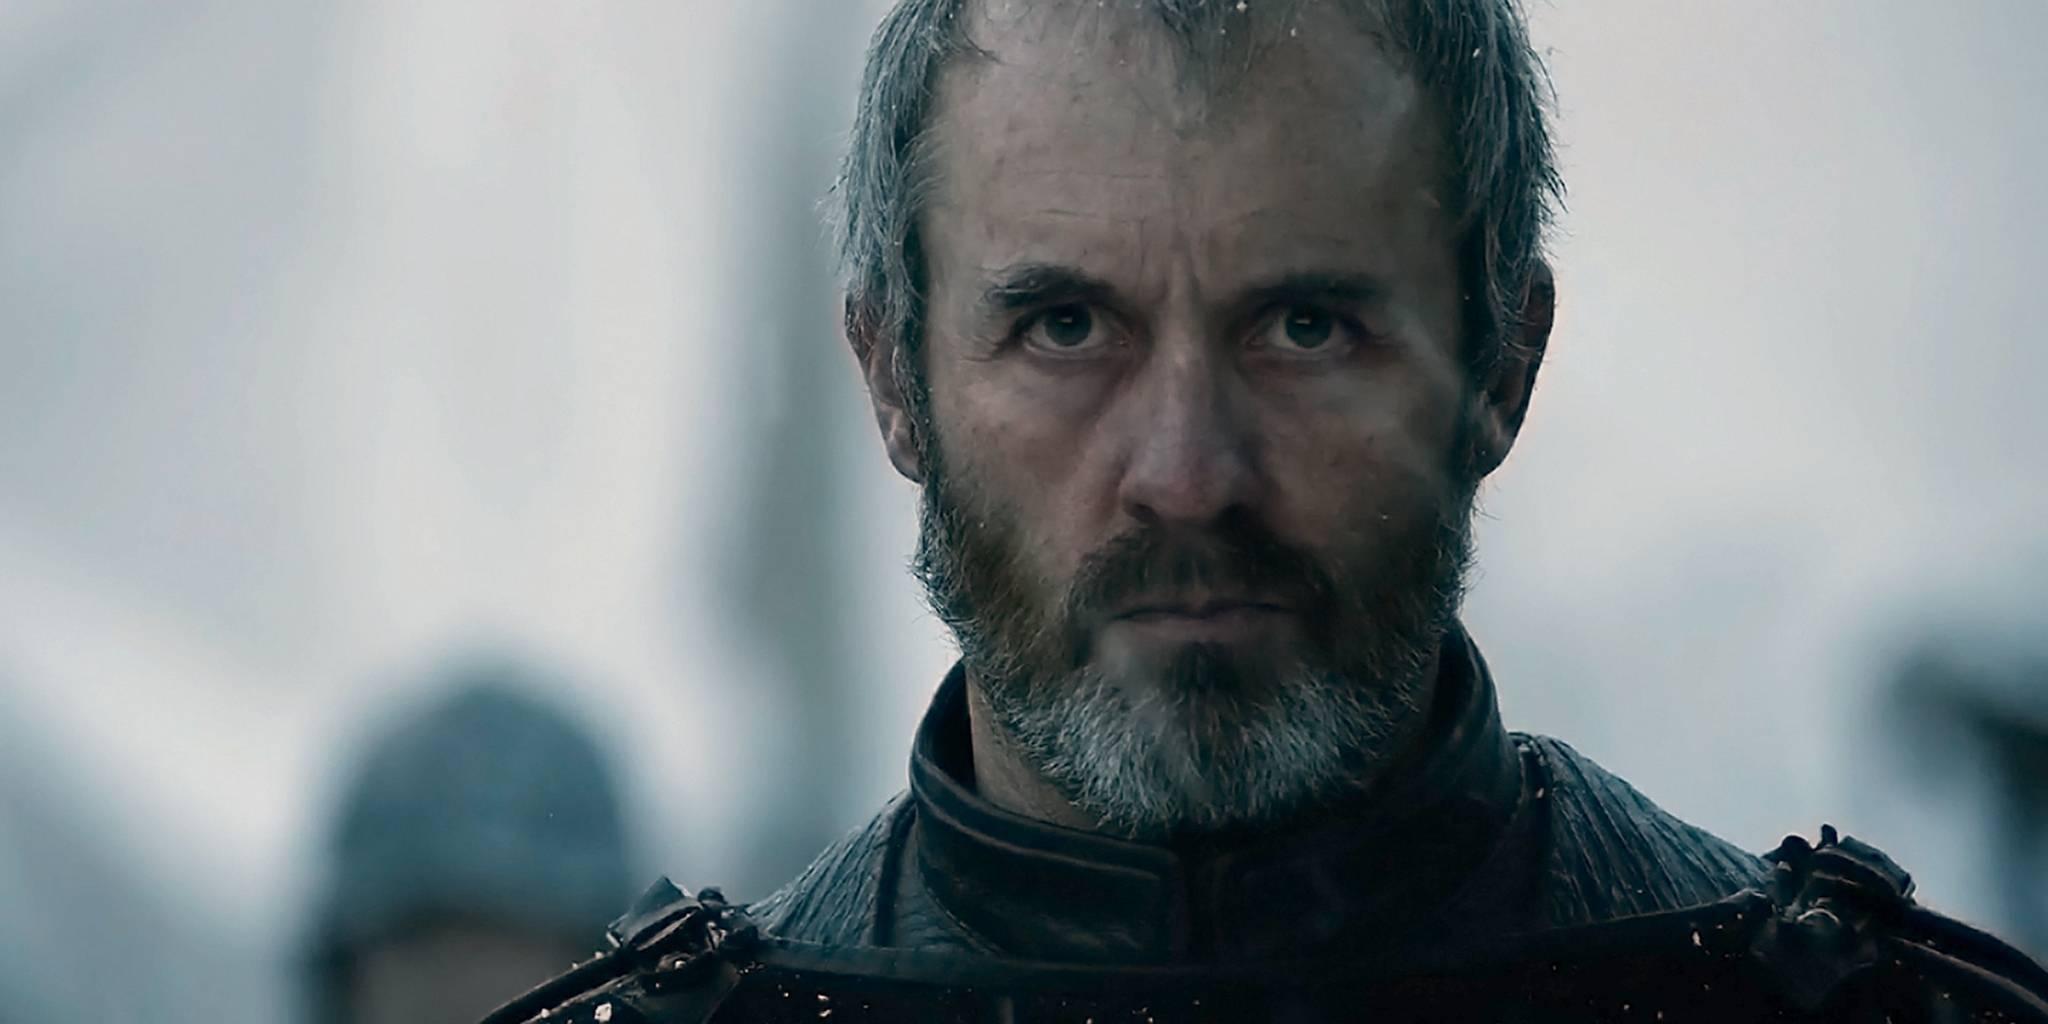 Game of Thrones Stannis Baratheon Maximum Bioavailability Supplements